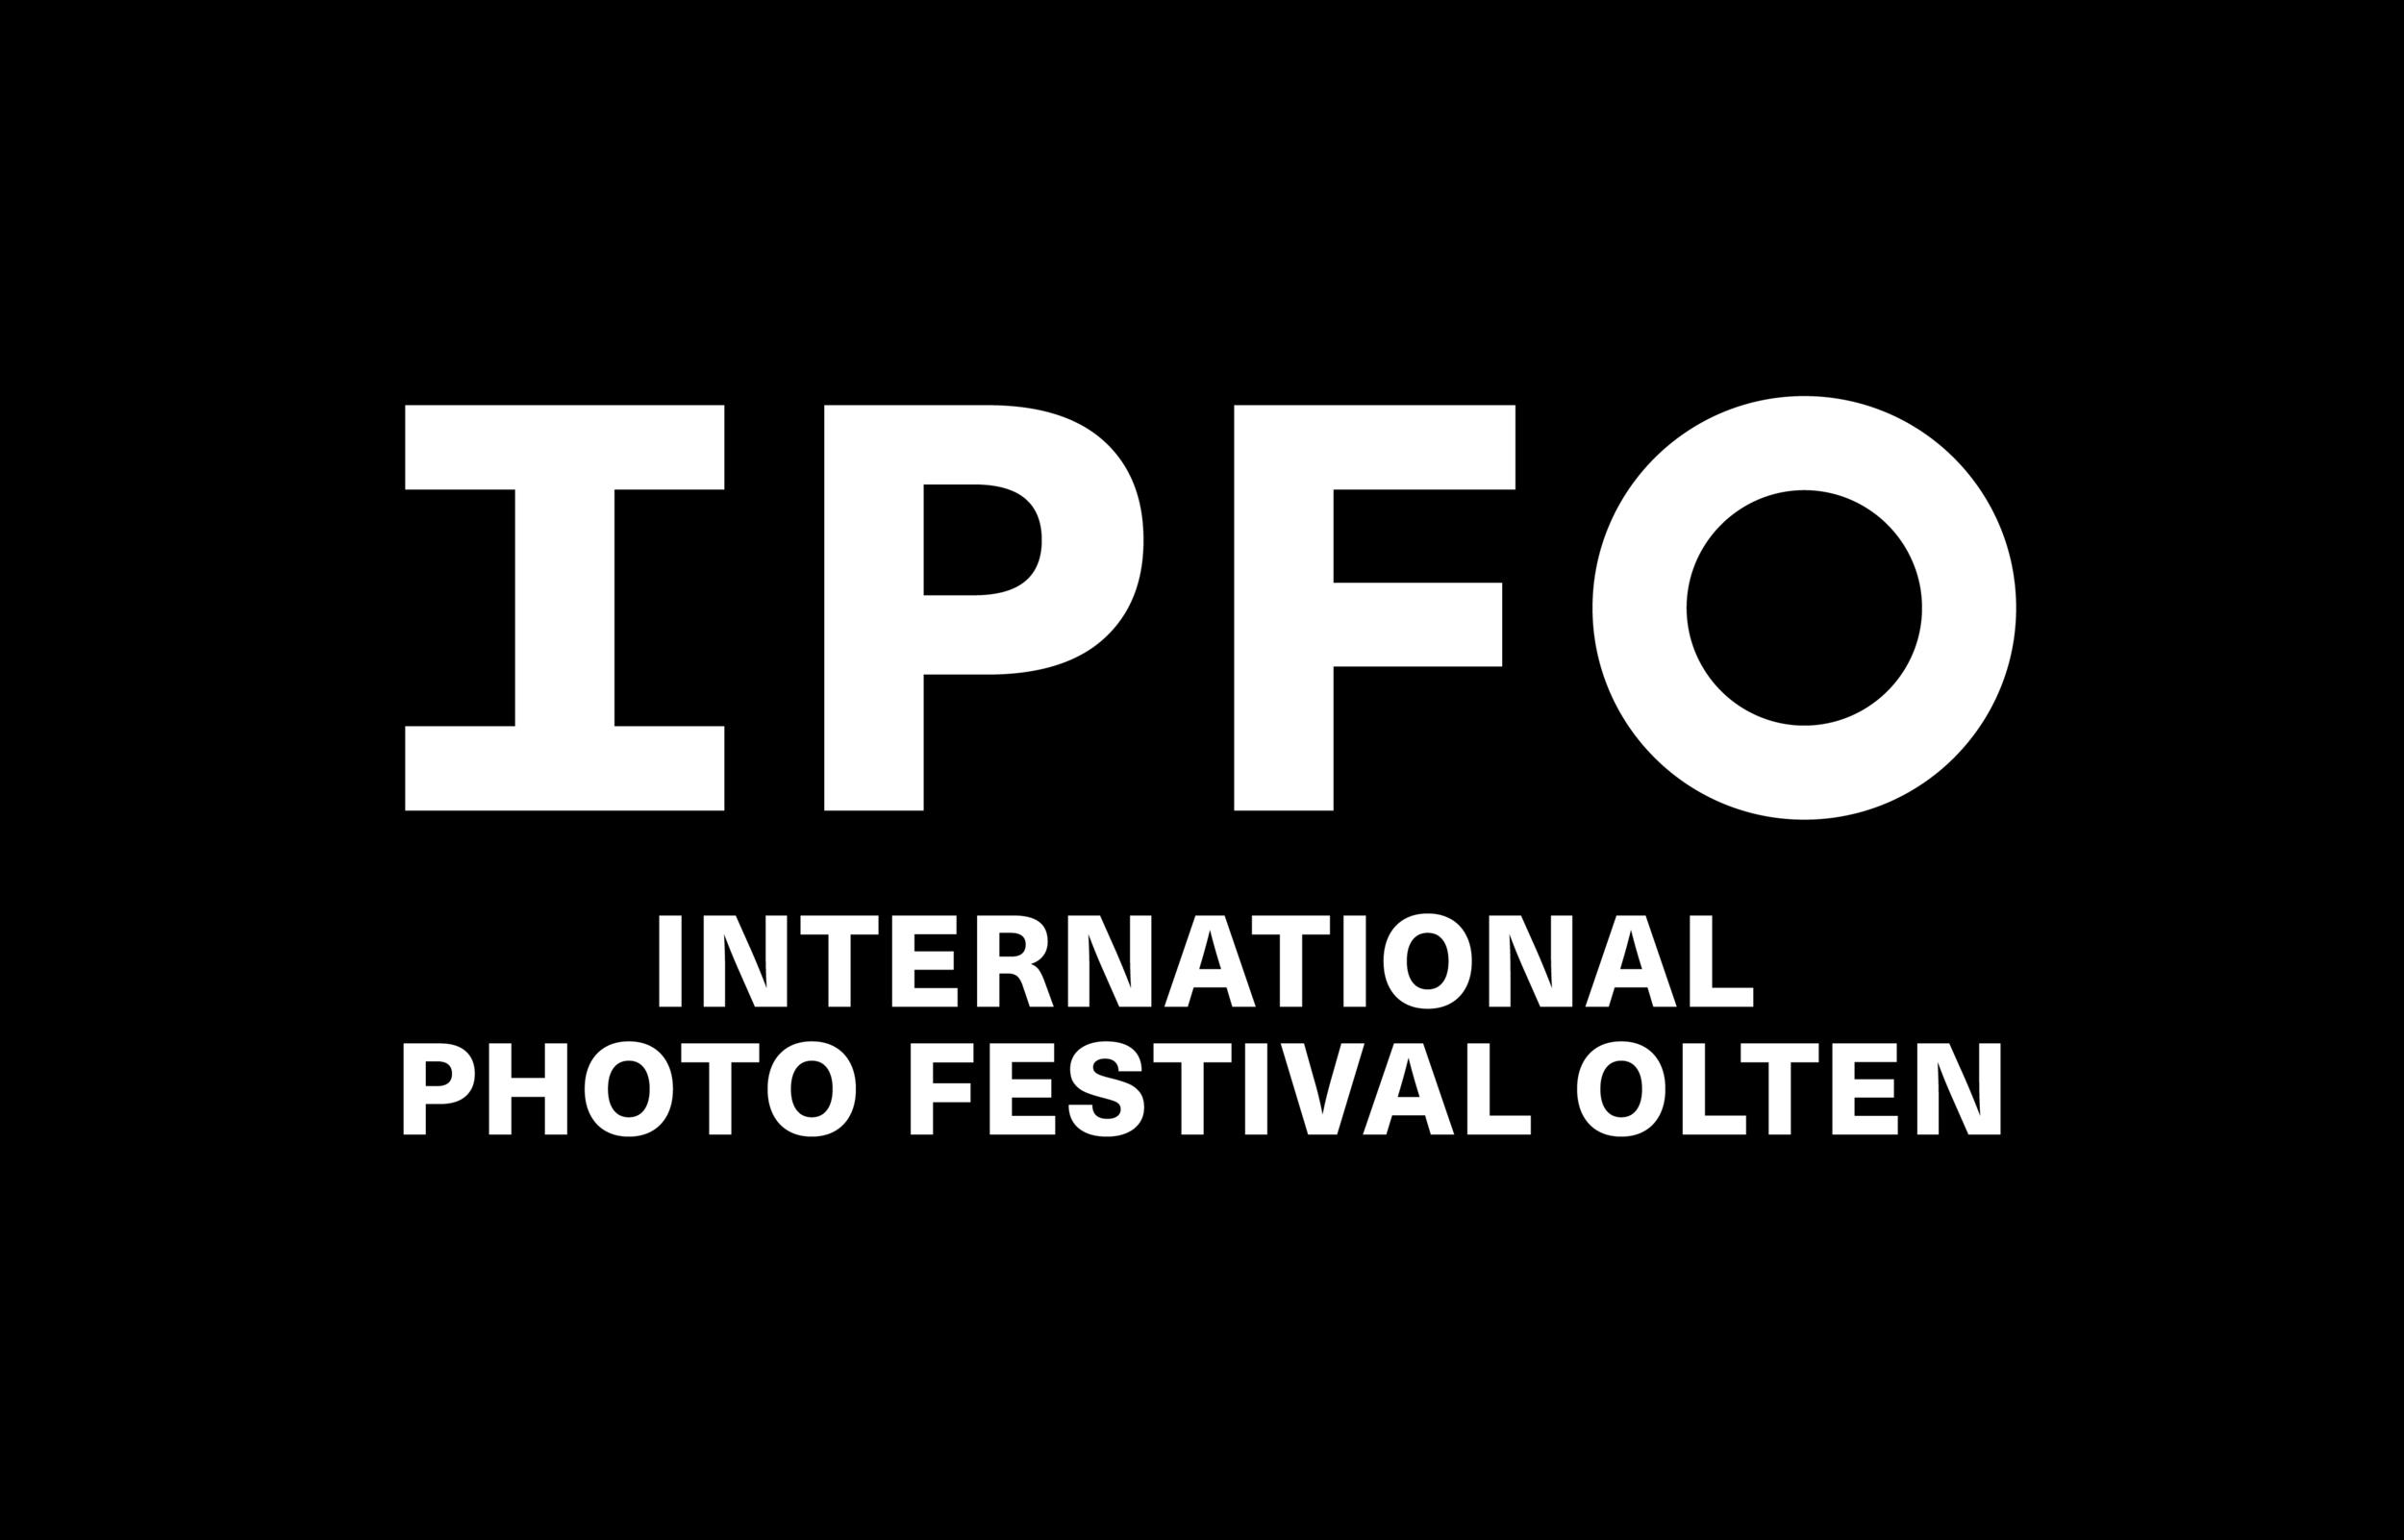 IPFO_Logo_Line_Text_Savezone2.png